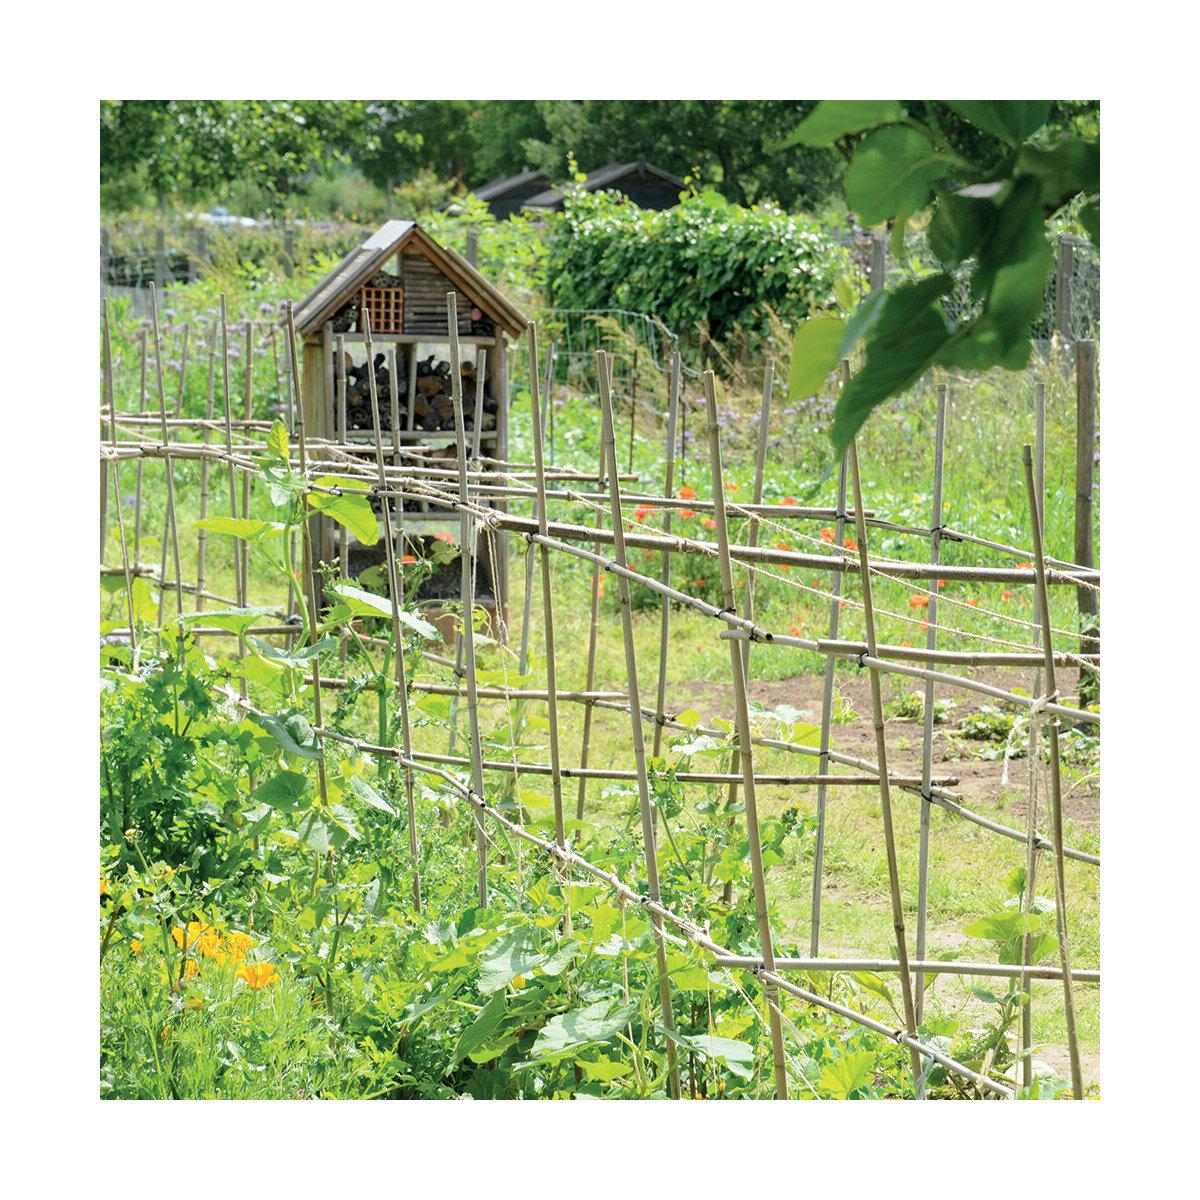 Calendrier Du Jardinier 2021 calendrier Potager 2021